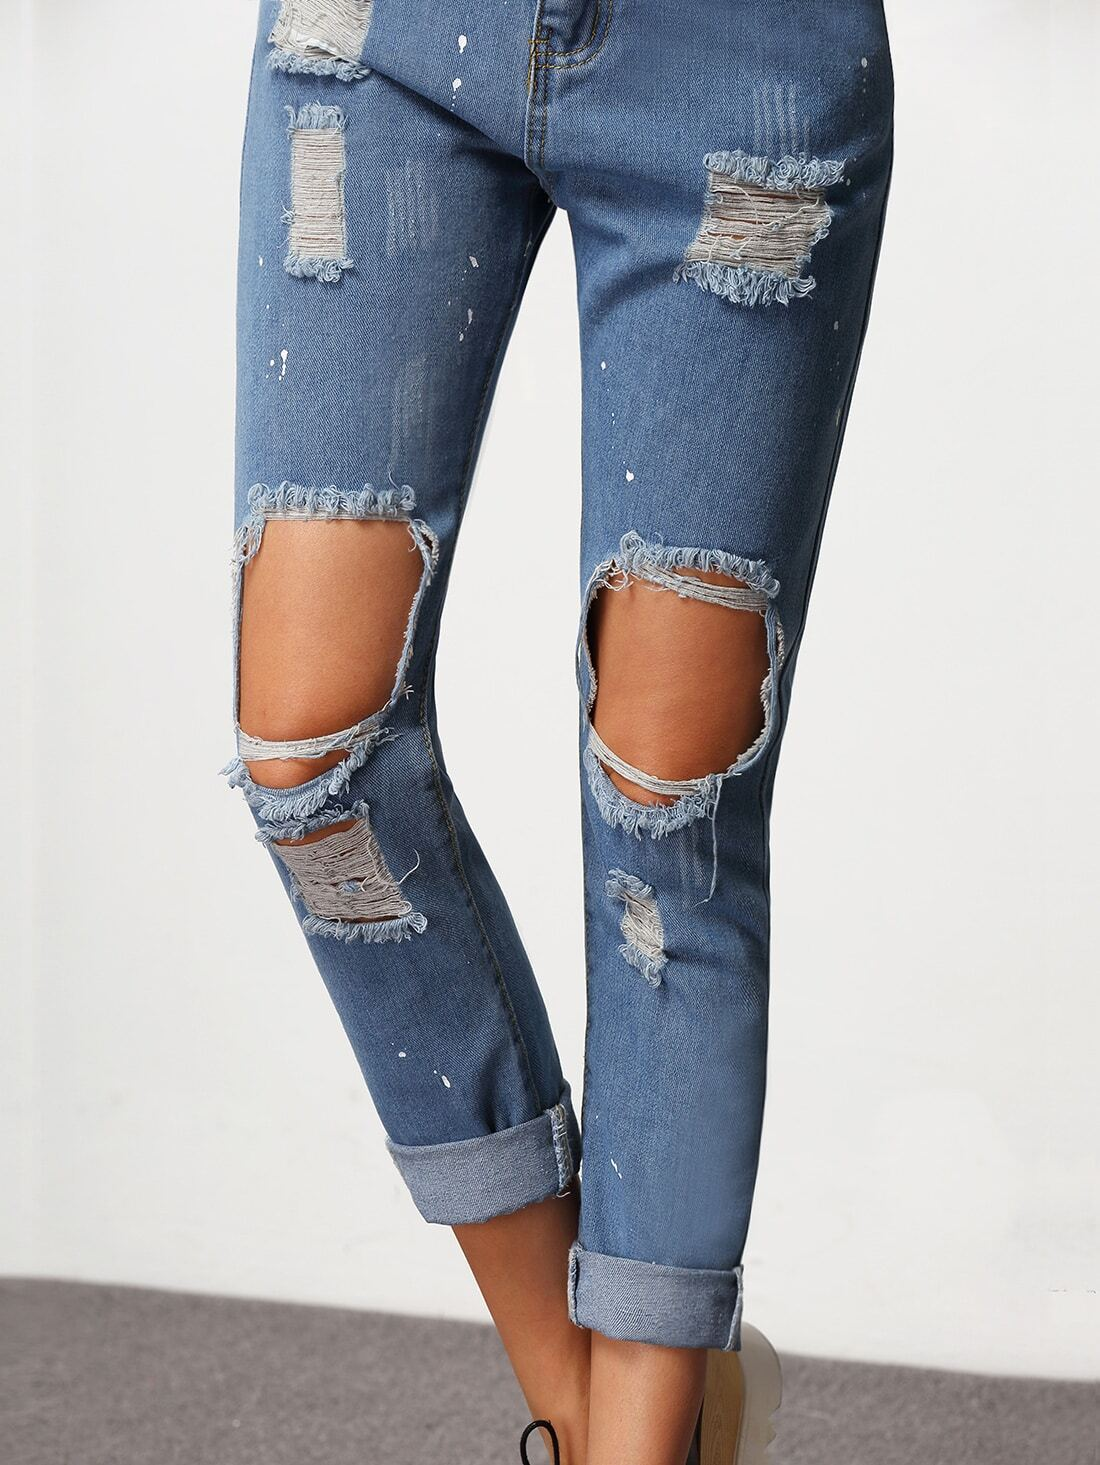 pantalon en denim effet d chir au genou bleu french shein sheinside. Black Bedroom Furniture Sets. Home Design Ideas